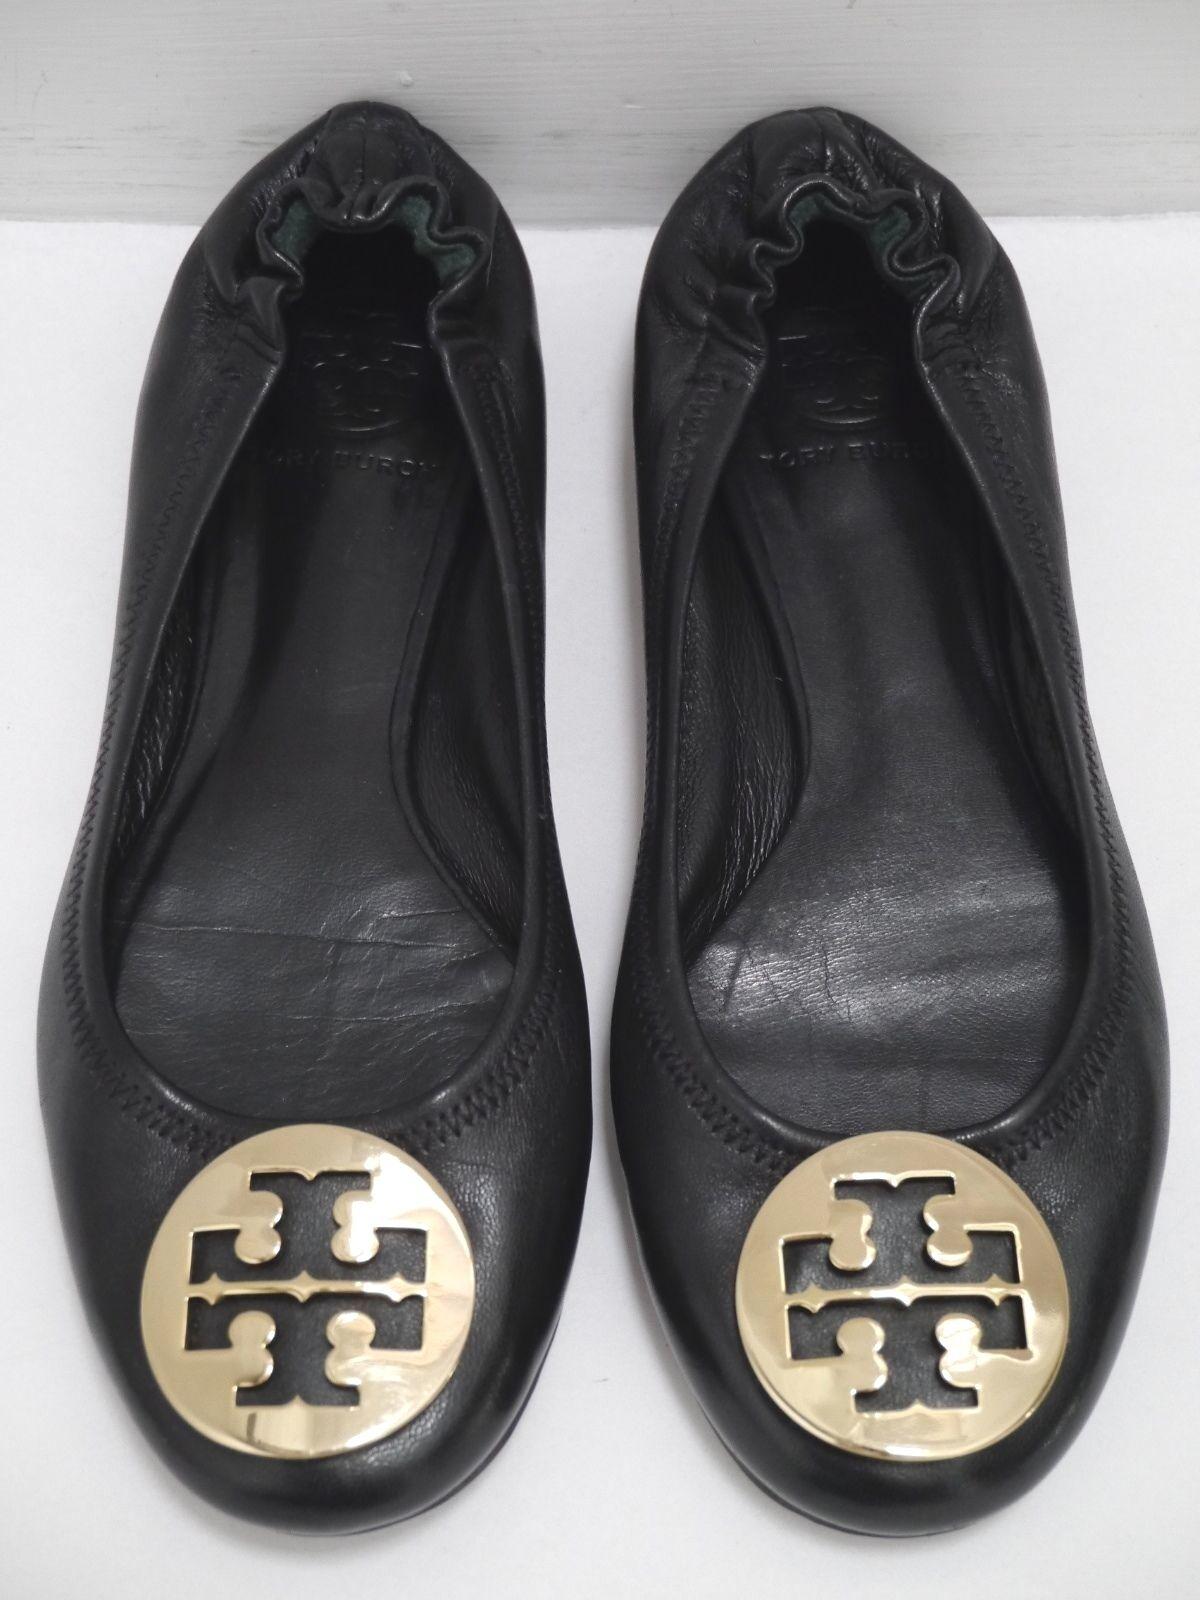 TORY BURCH Reva black leather gold logo detail ballet flats shoes size 7.5